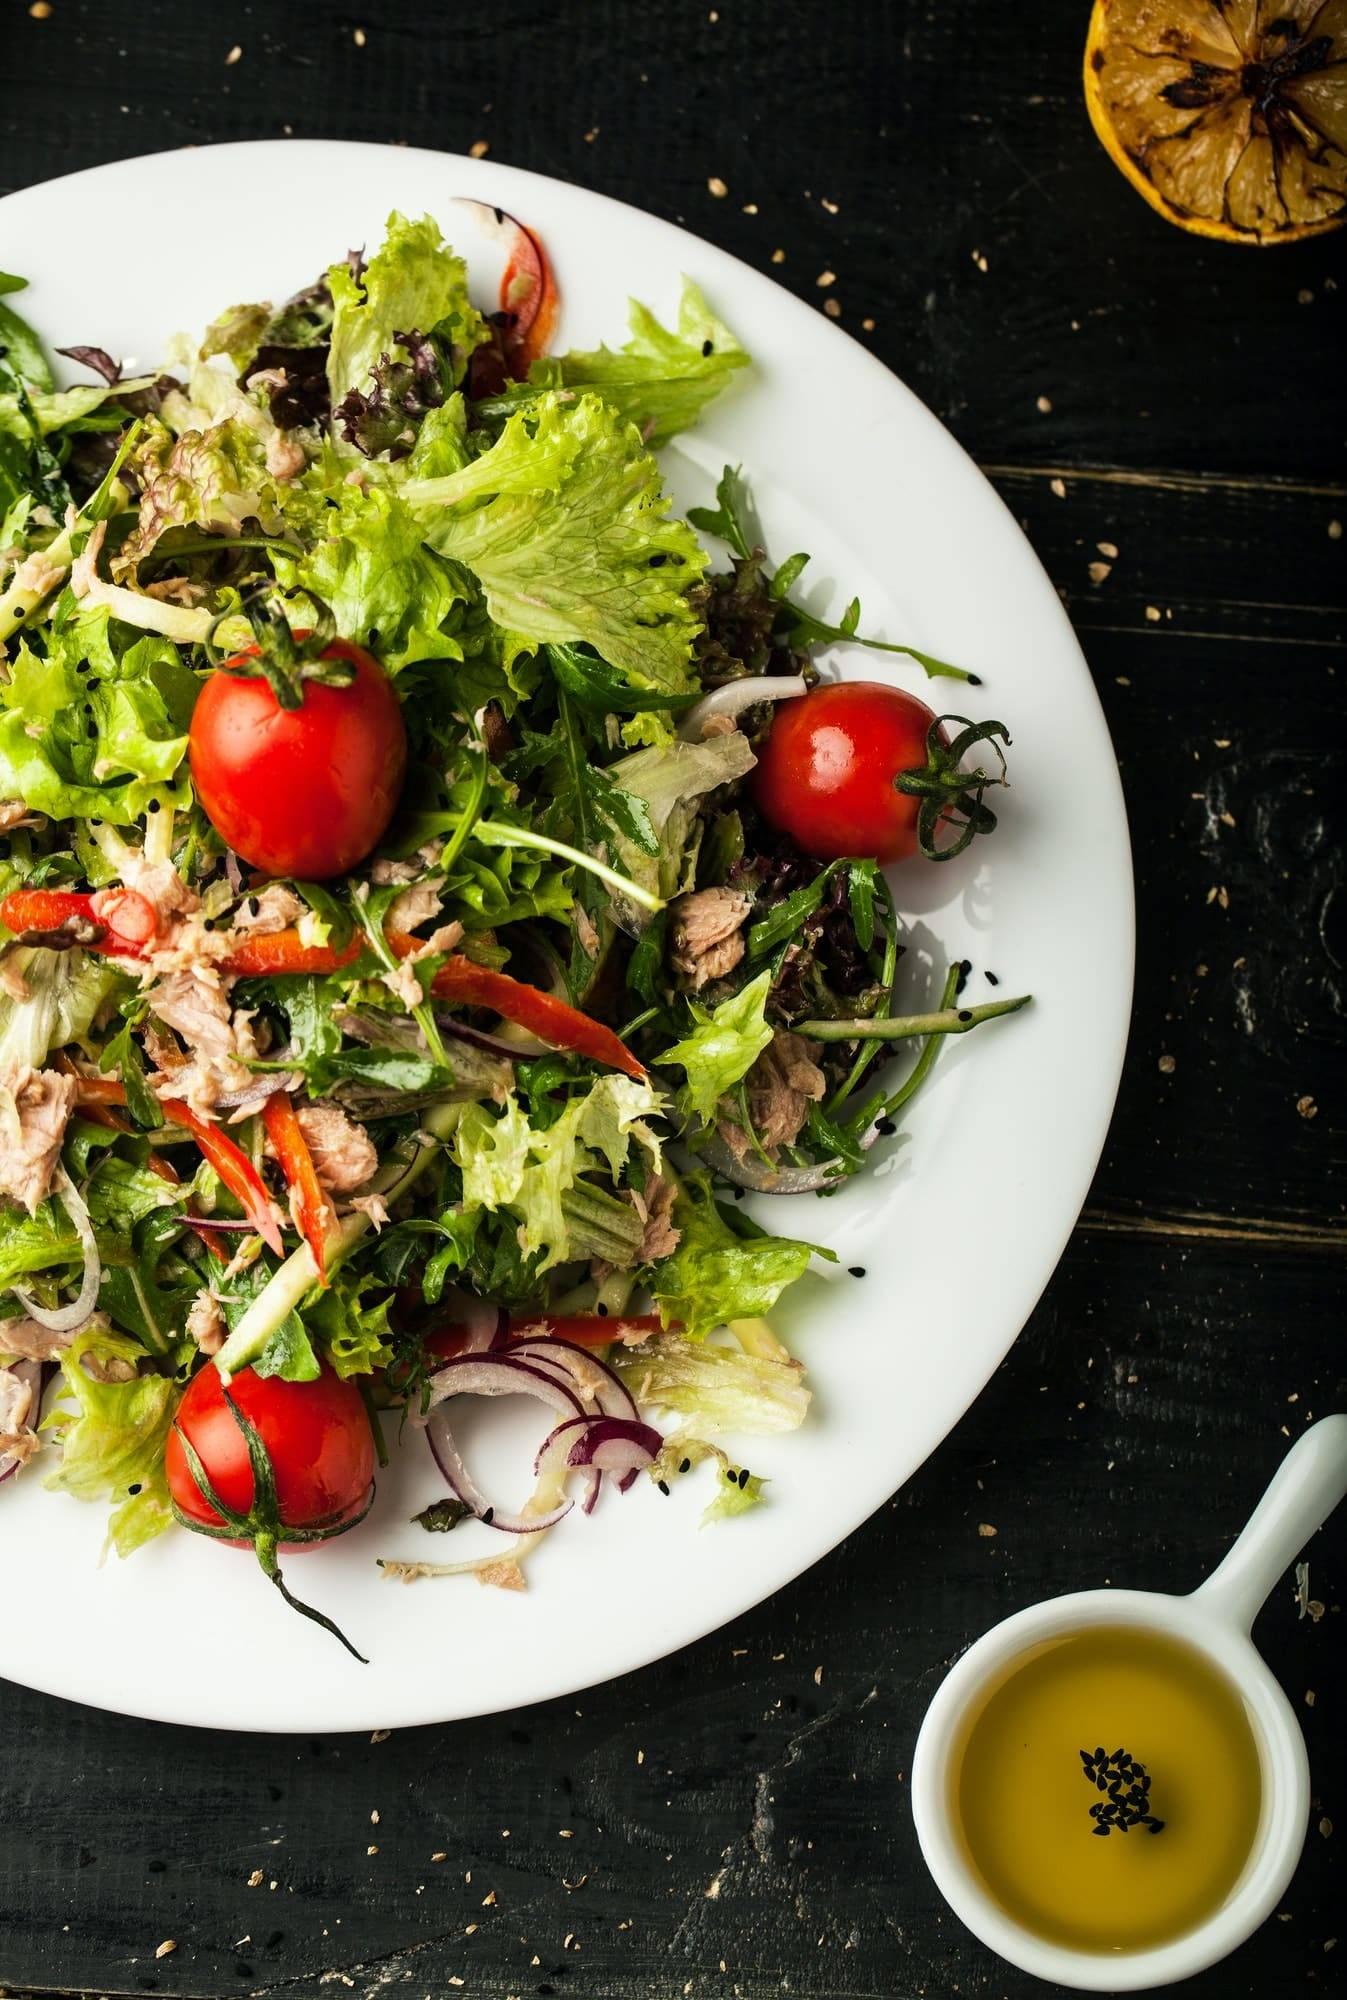 Tasty salad with tuna on dark background